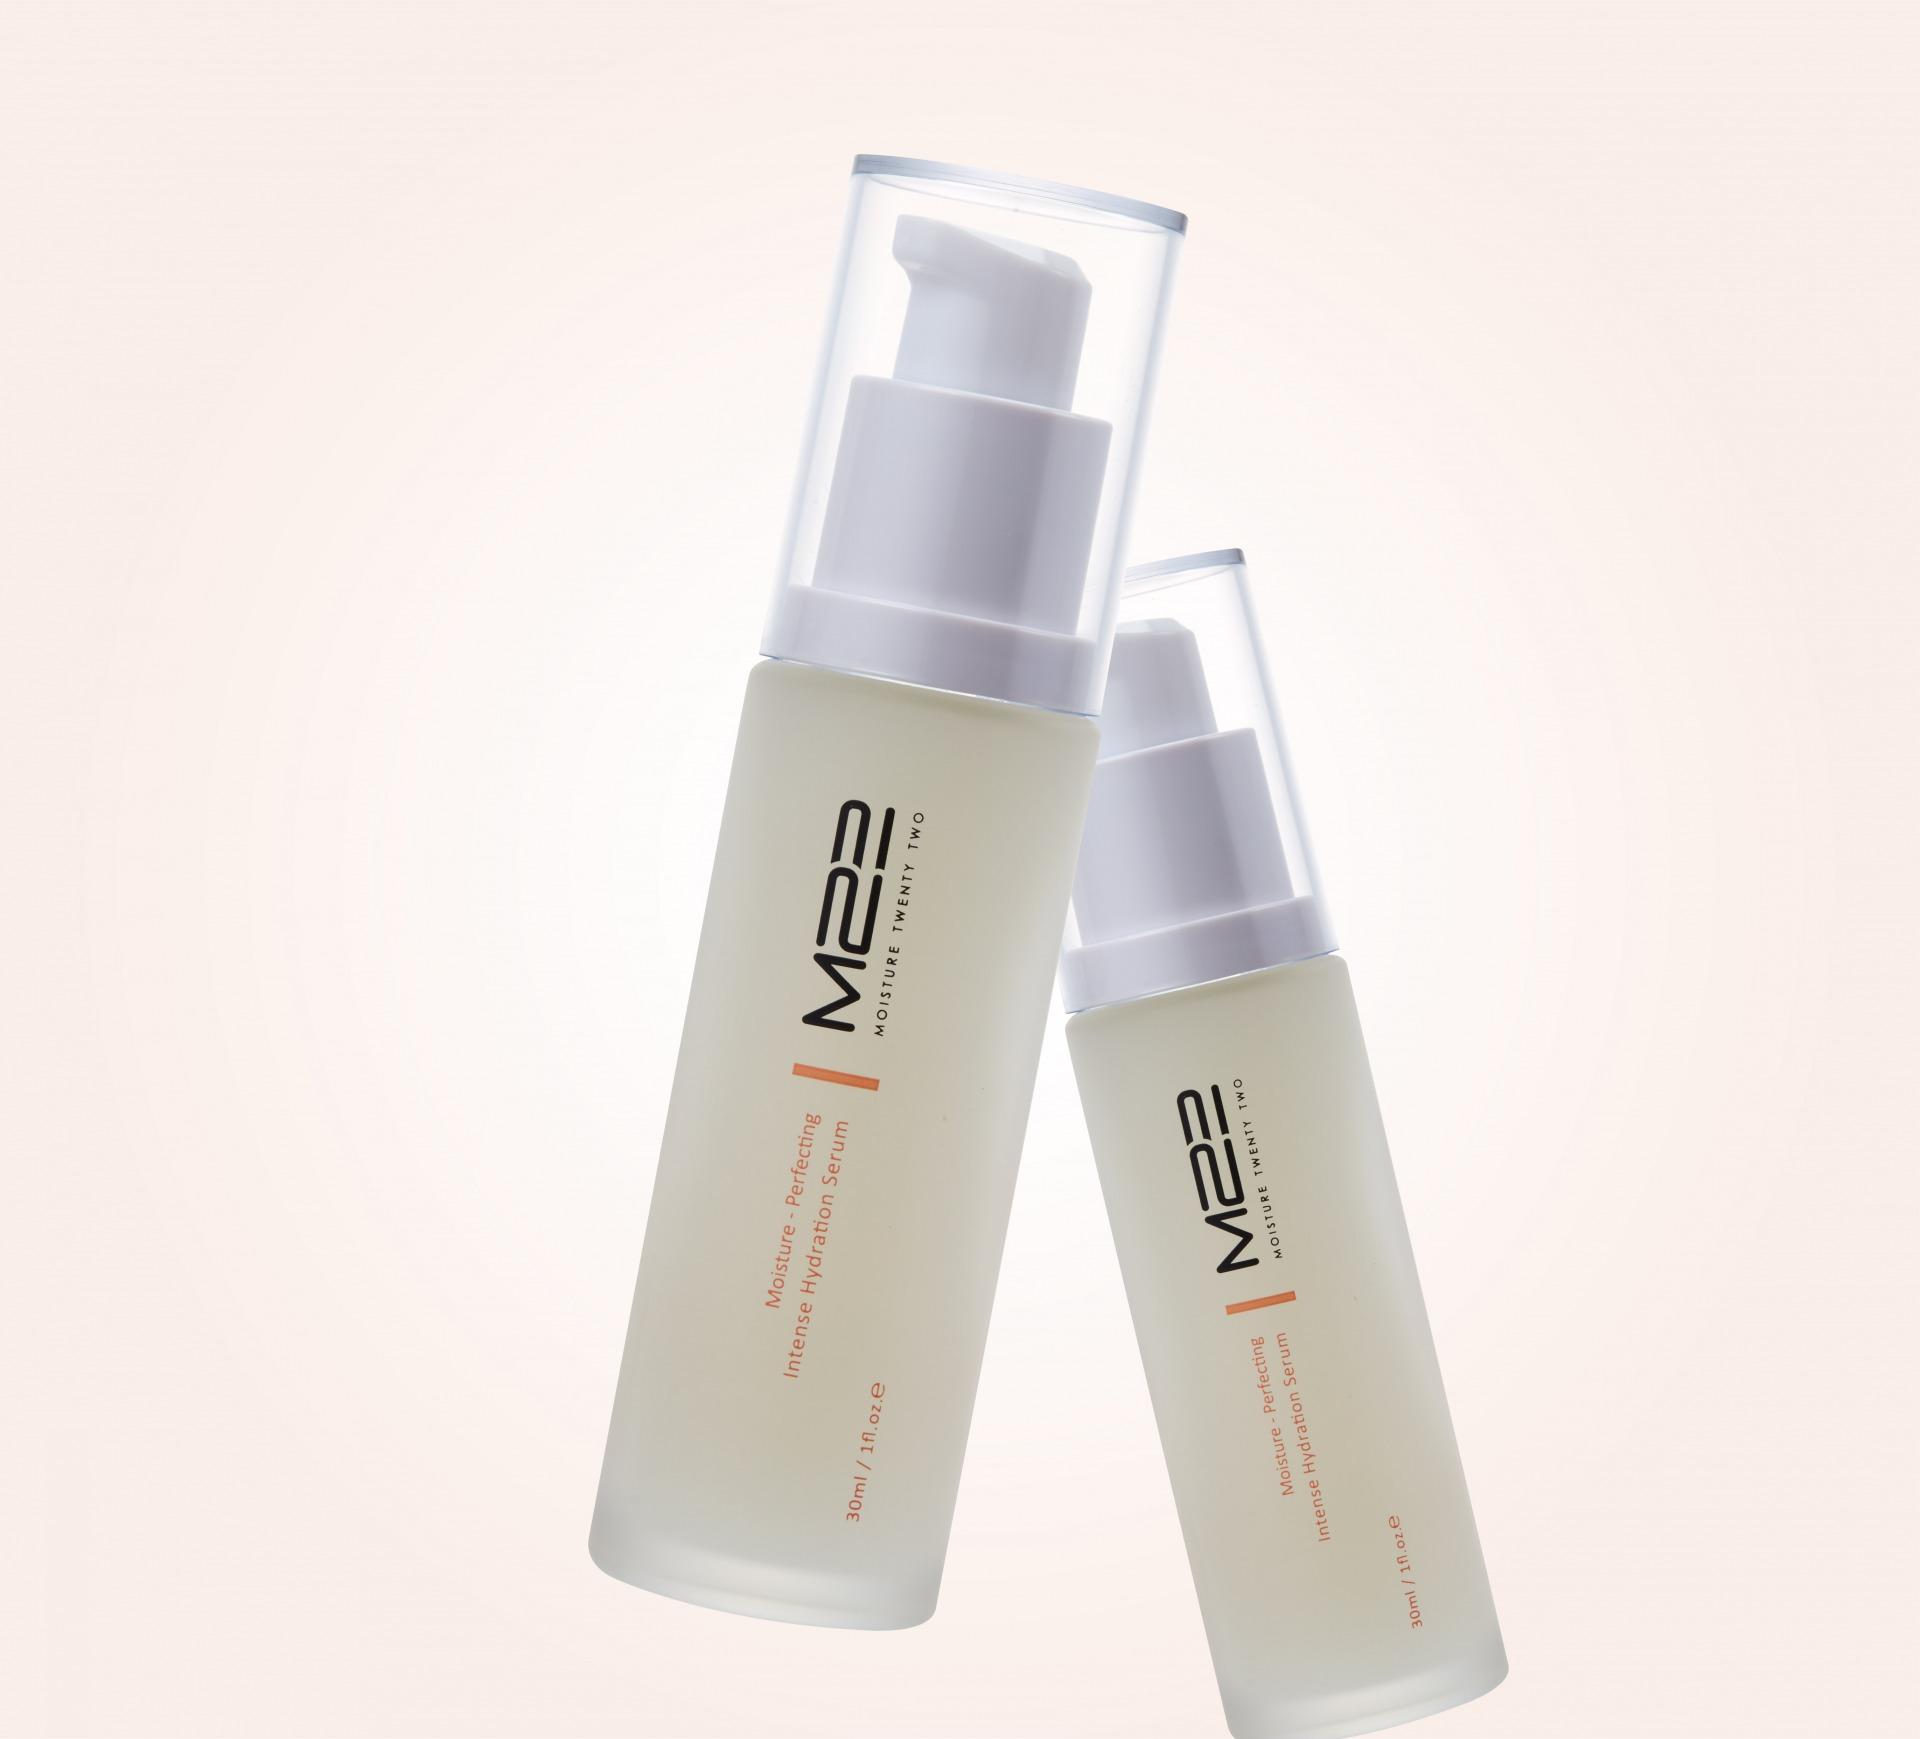 M22_v2_Products特潤保濕_特潤保濕精華V2_product01